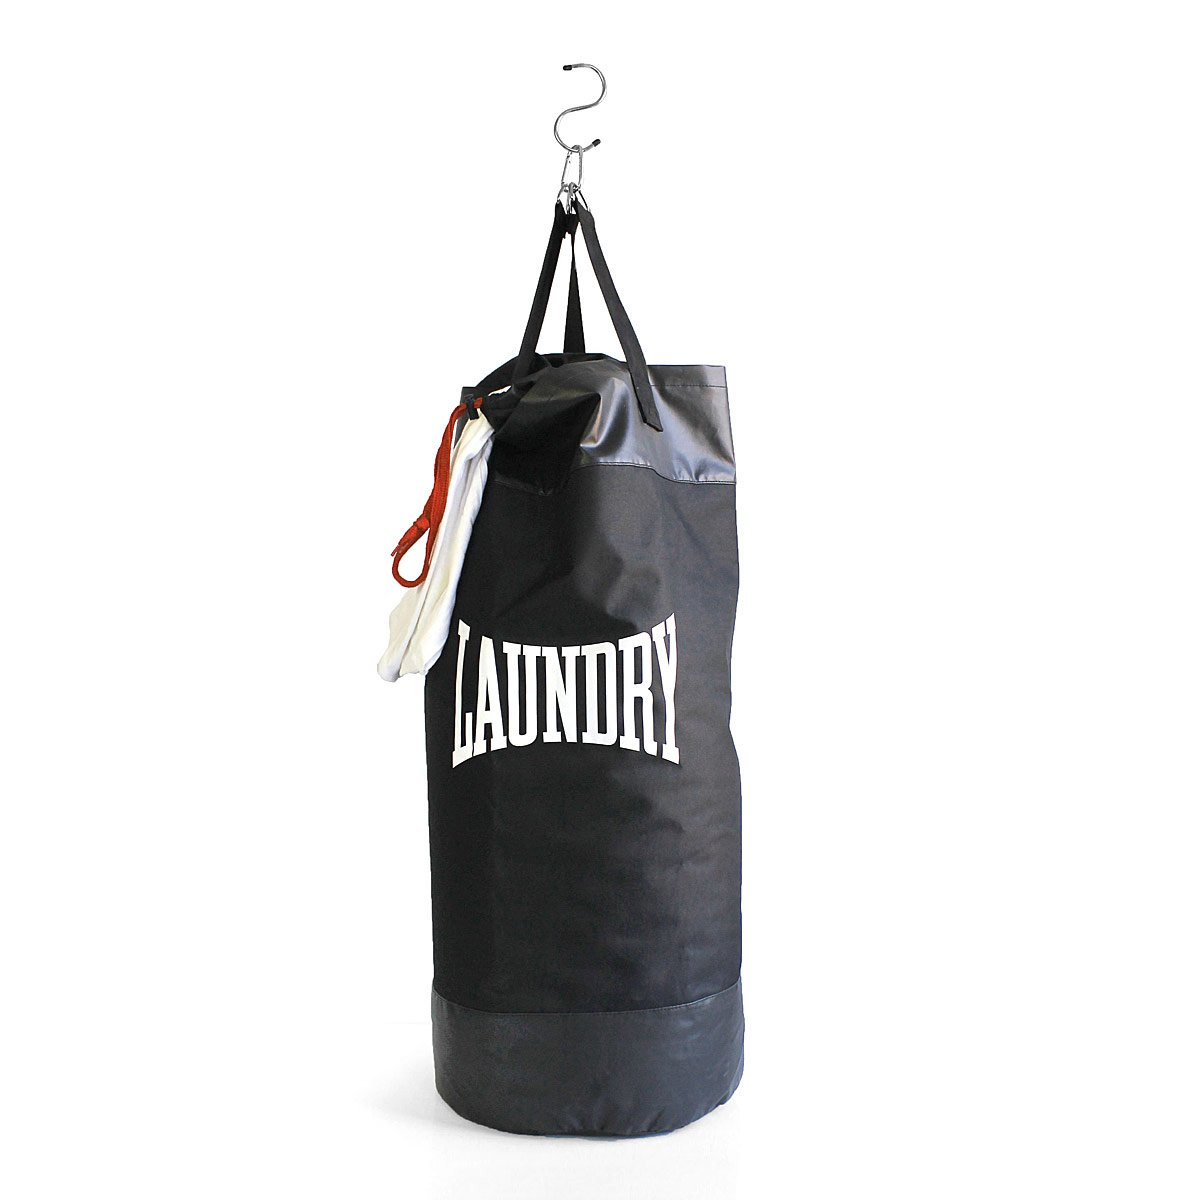 Laundry Punch Bag 1 Thumbnail